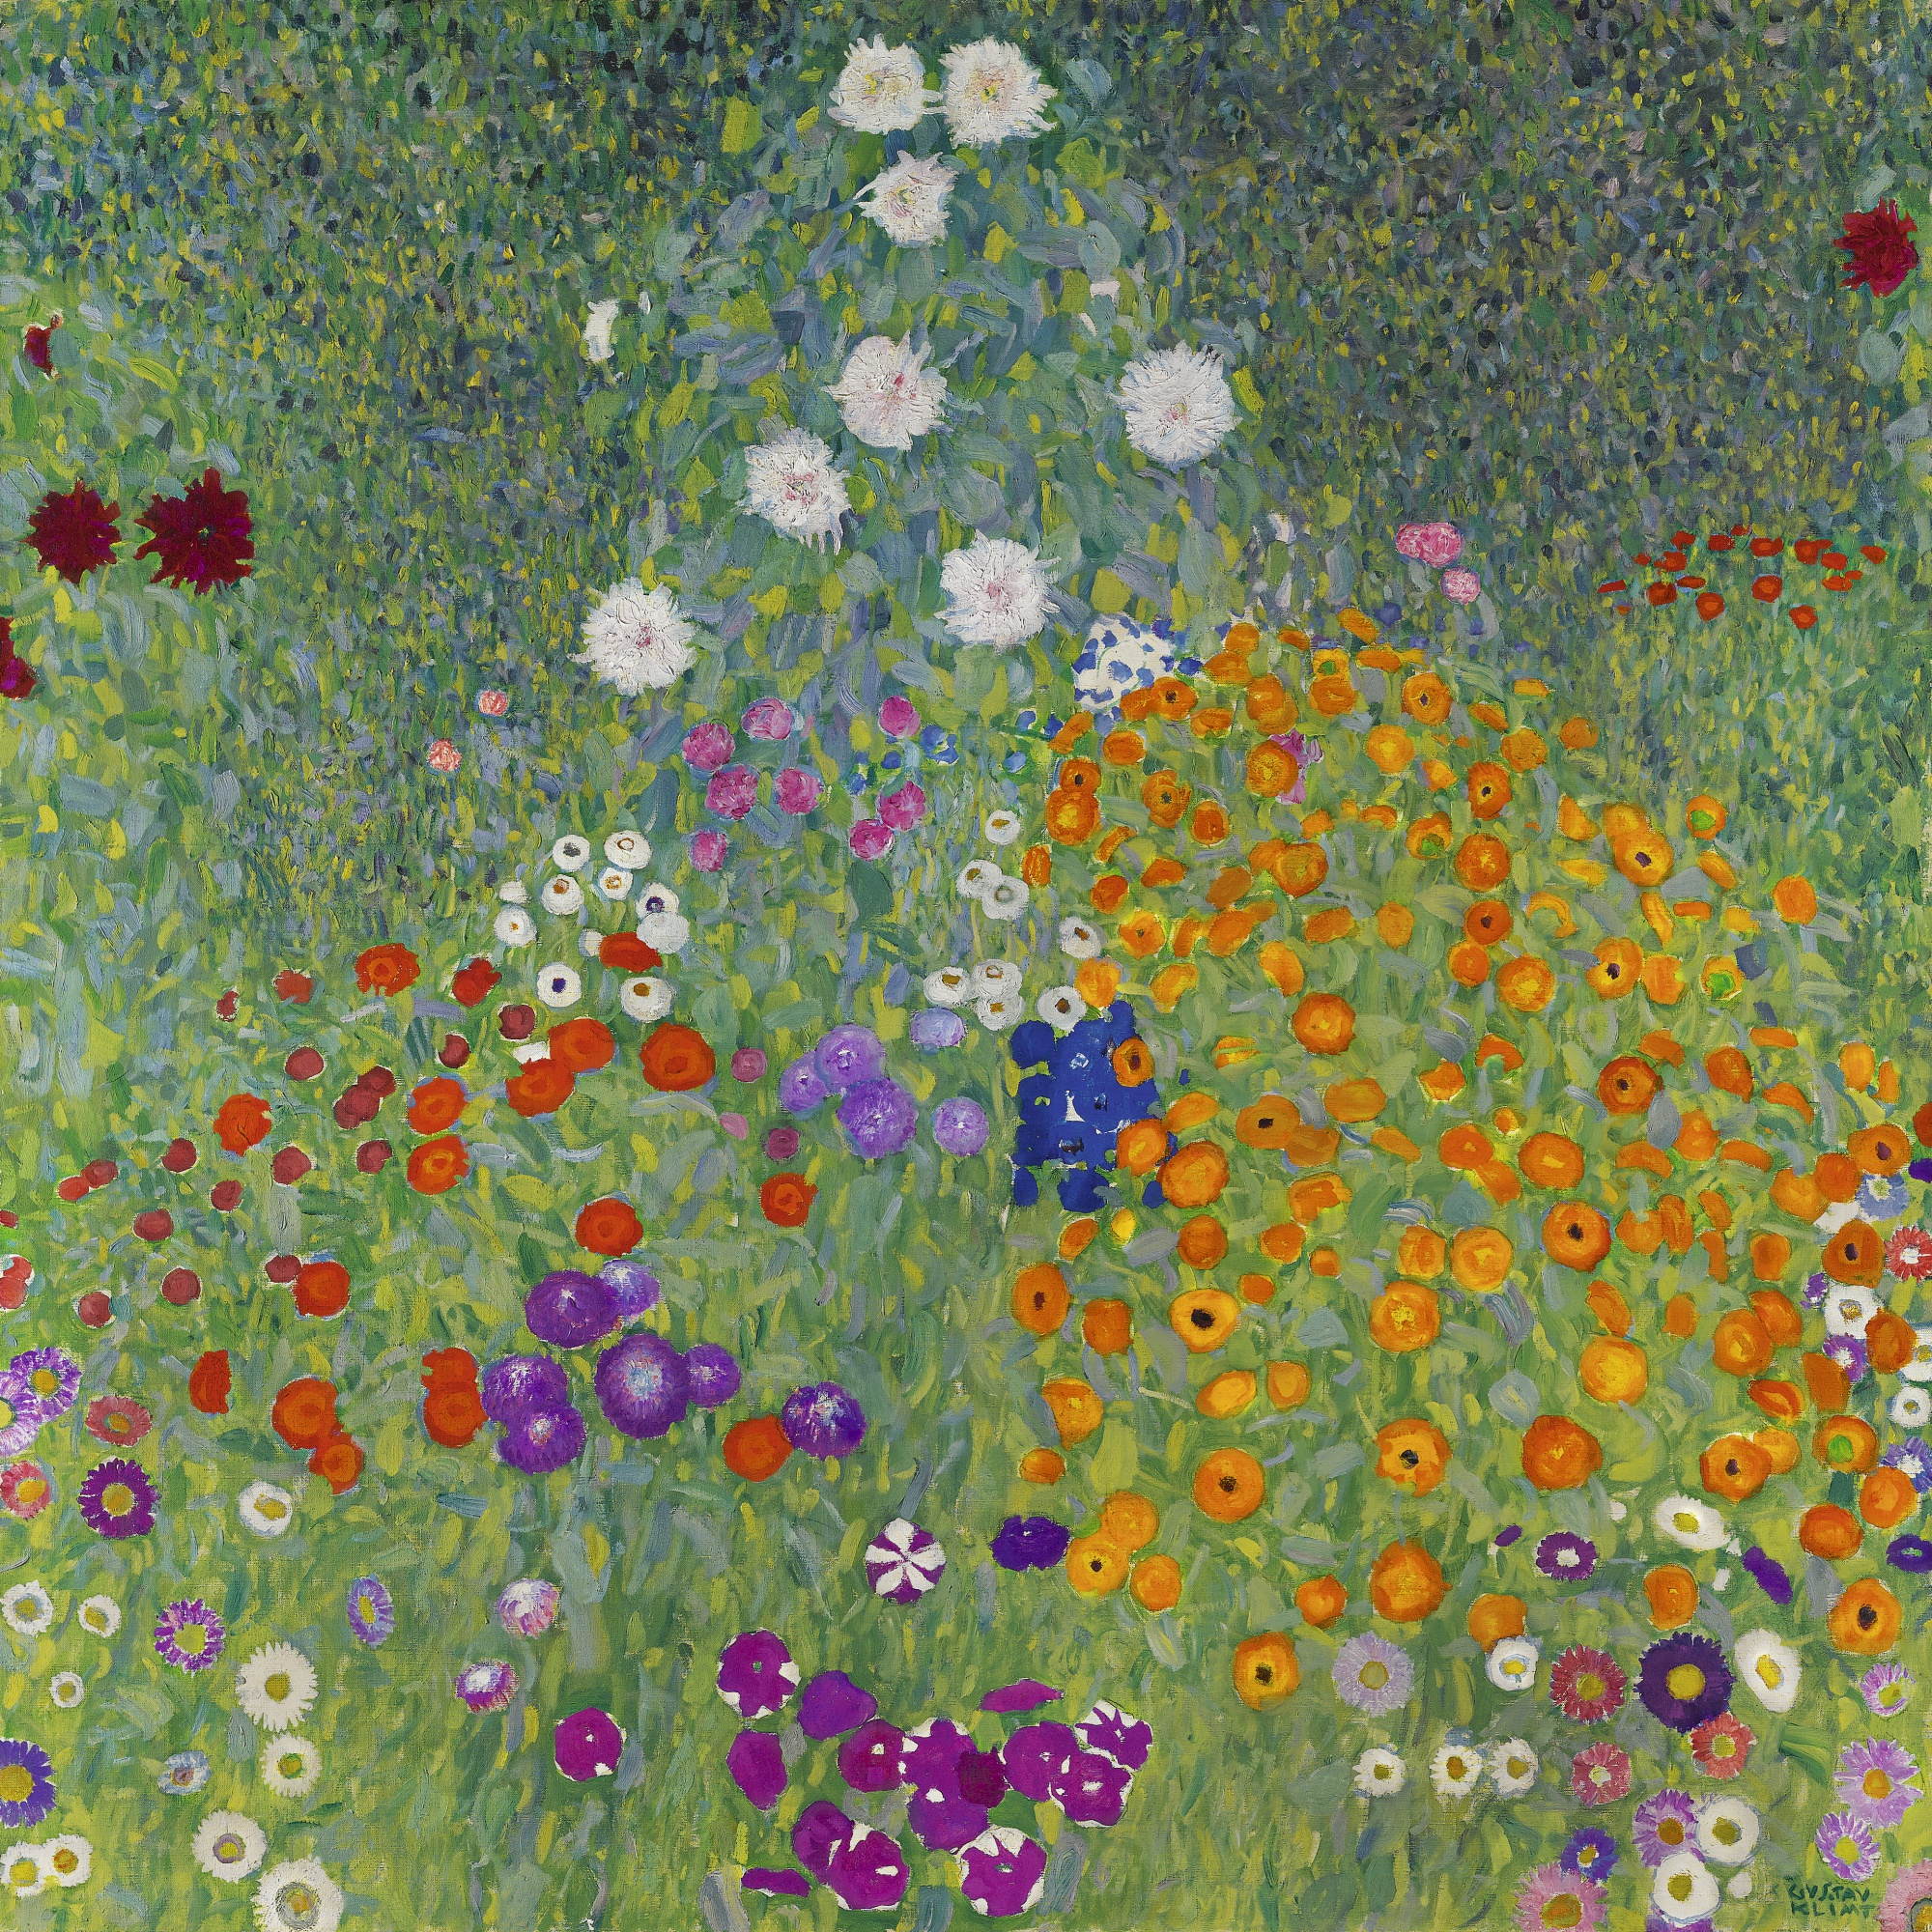 Flower Garden, by Gustav Klimt, 1907